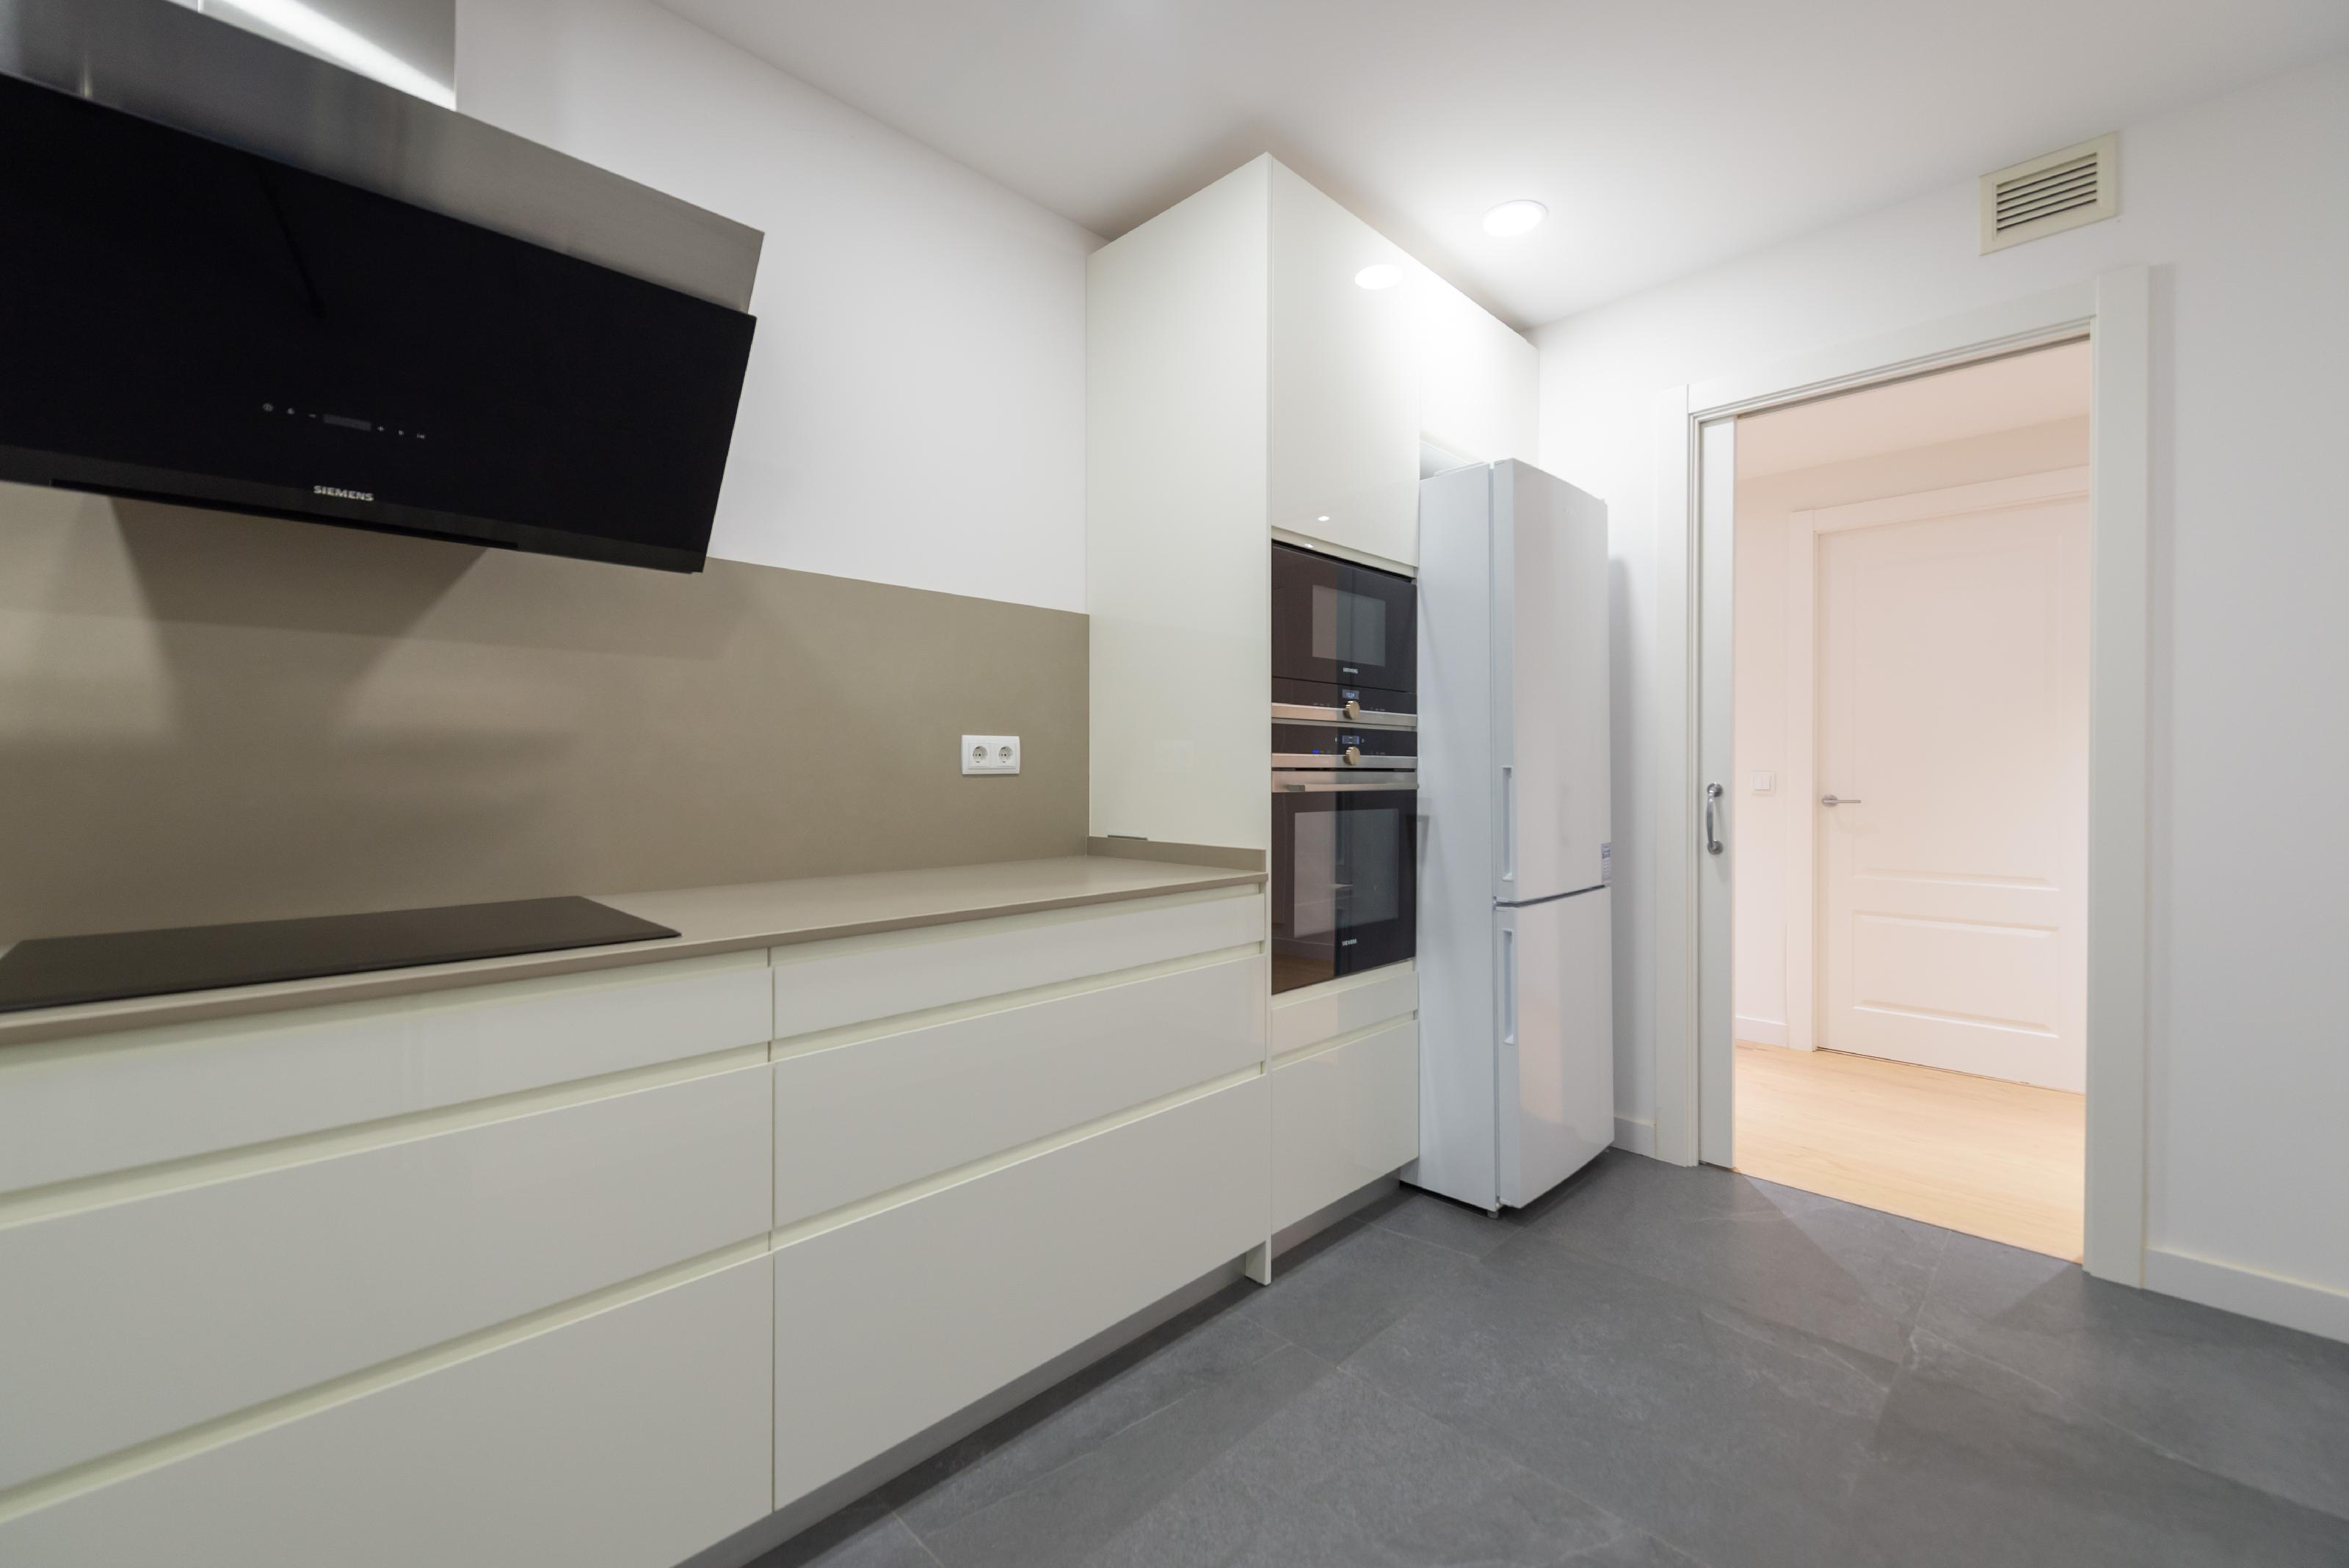 245231 Flat for sale in Sarrià-Sant Gervasi, Sant Gervasi-Galvany 18